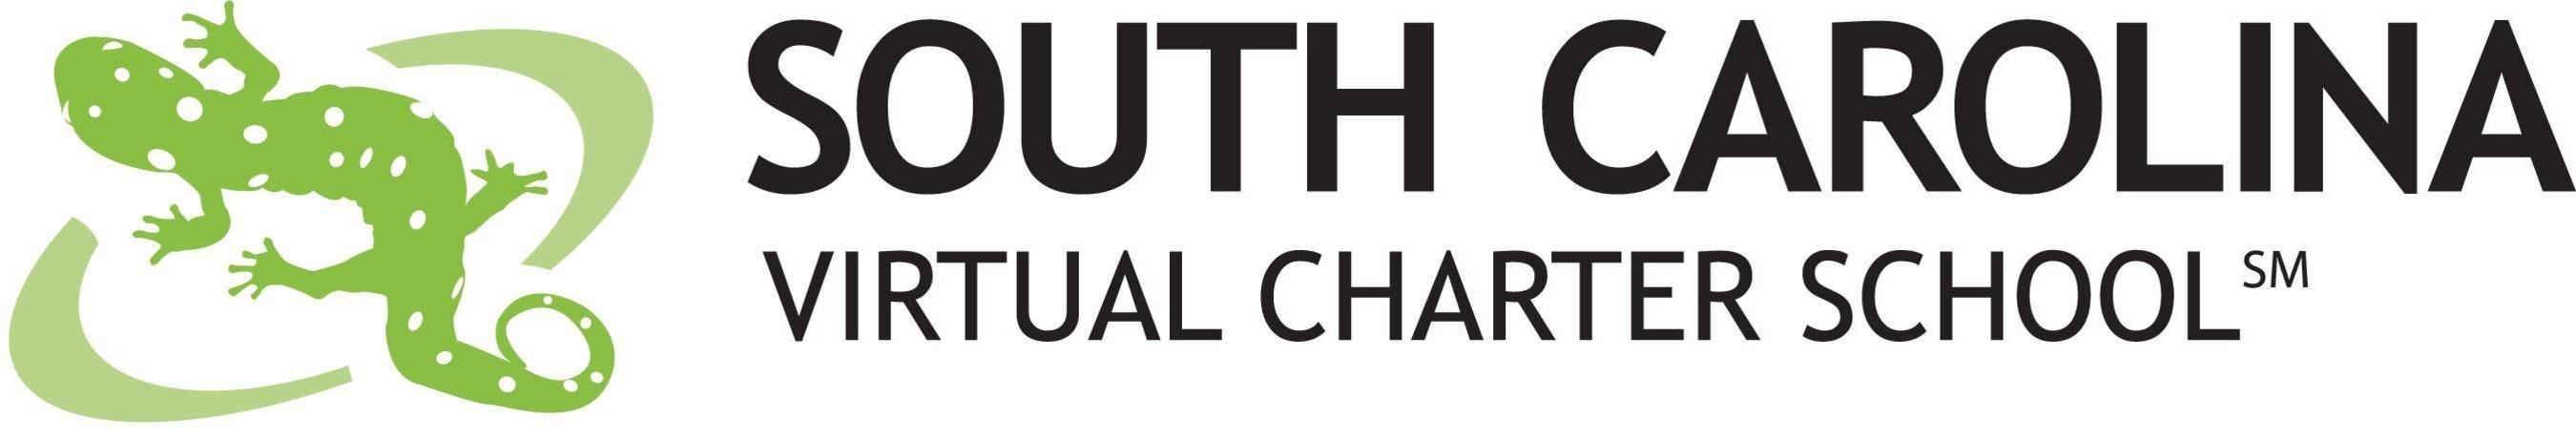 South Carolina Virtual Charter School logo